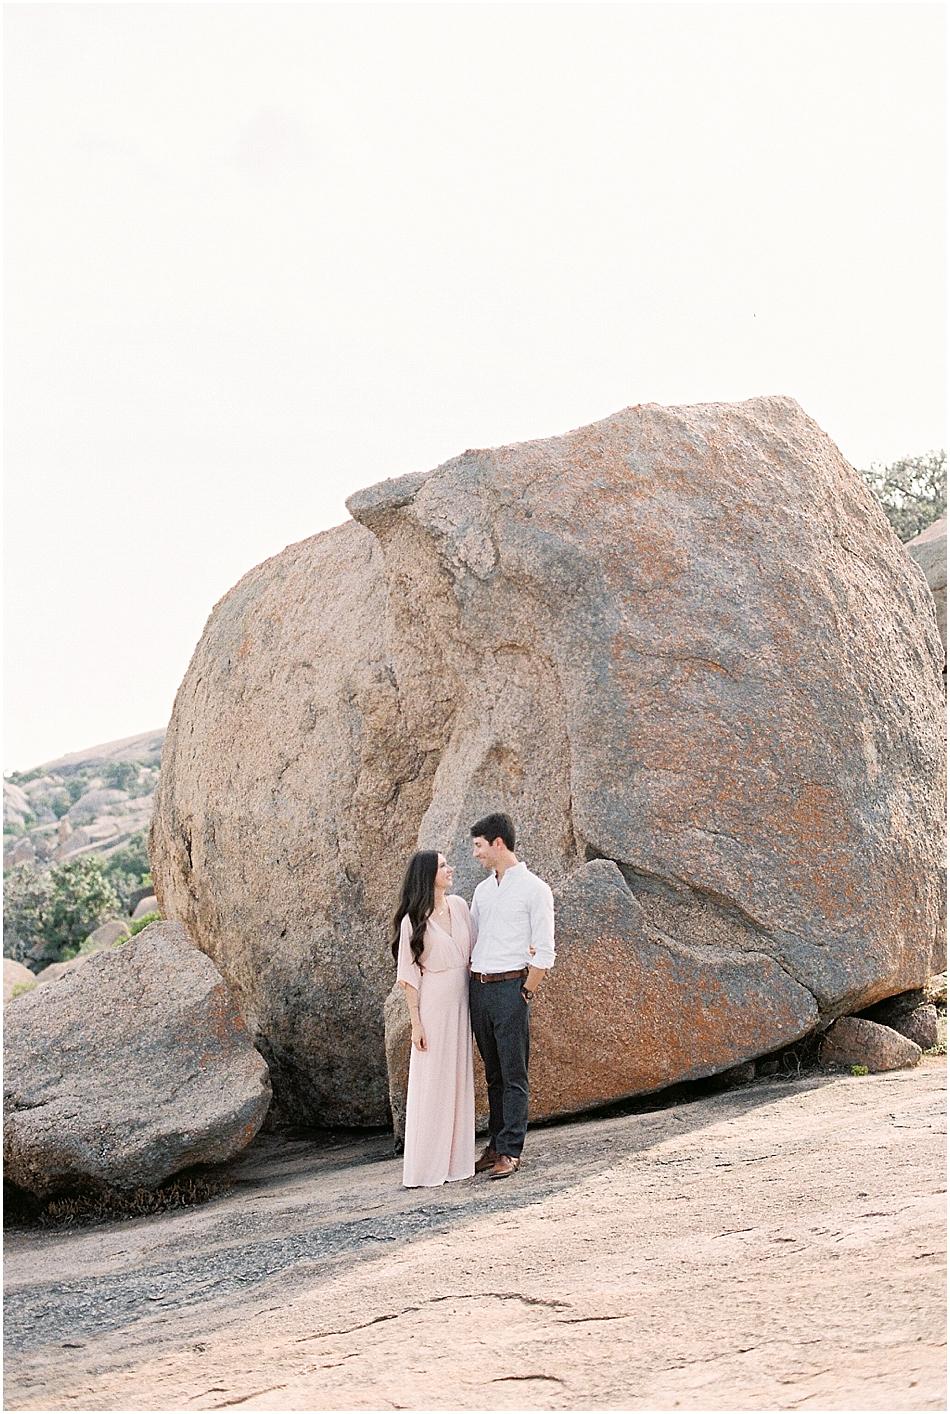 Emilie Anne Photography | Fine Art Film | Featured | Magnolia Rouge | Central Texas-14.jpg